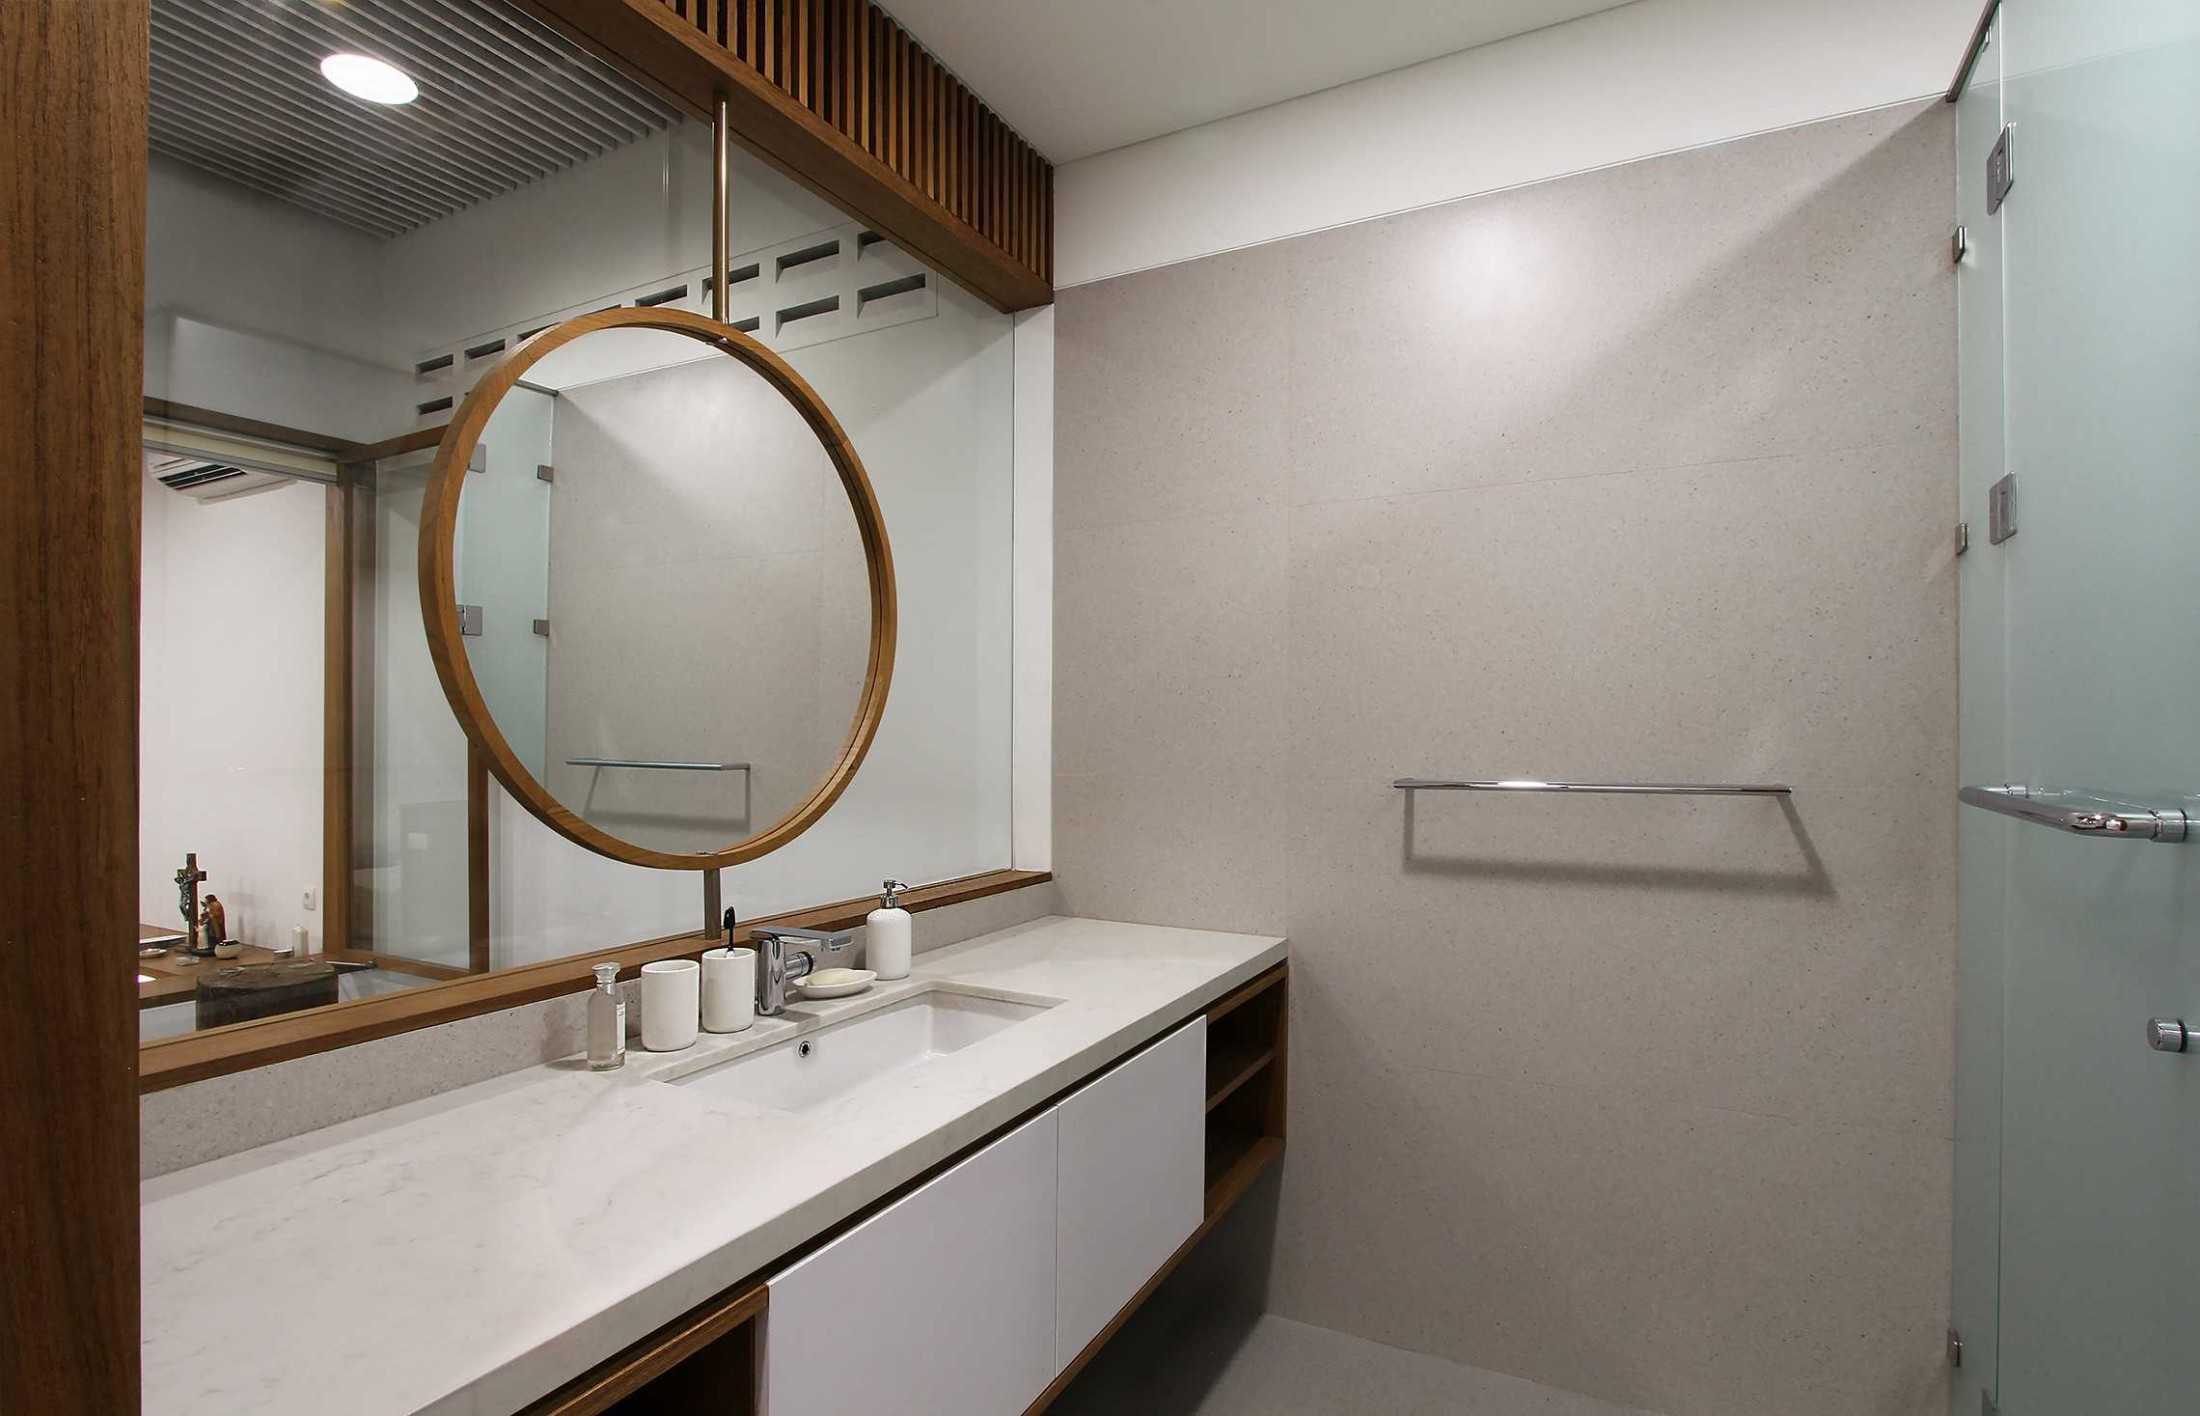 Sasmita Design Studio Penguin House Bandung, Kota Bandung, Jawa Barat, Indonesia Bandung, Kota Bandung, Jawa Barat, Indonesia William-Sasmita-Penguin-House  91195